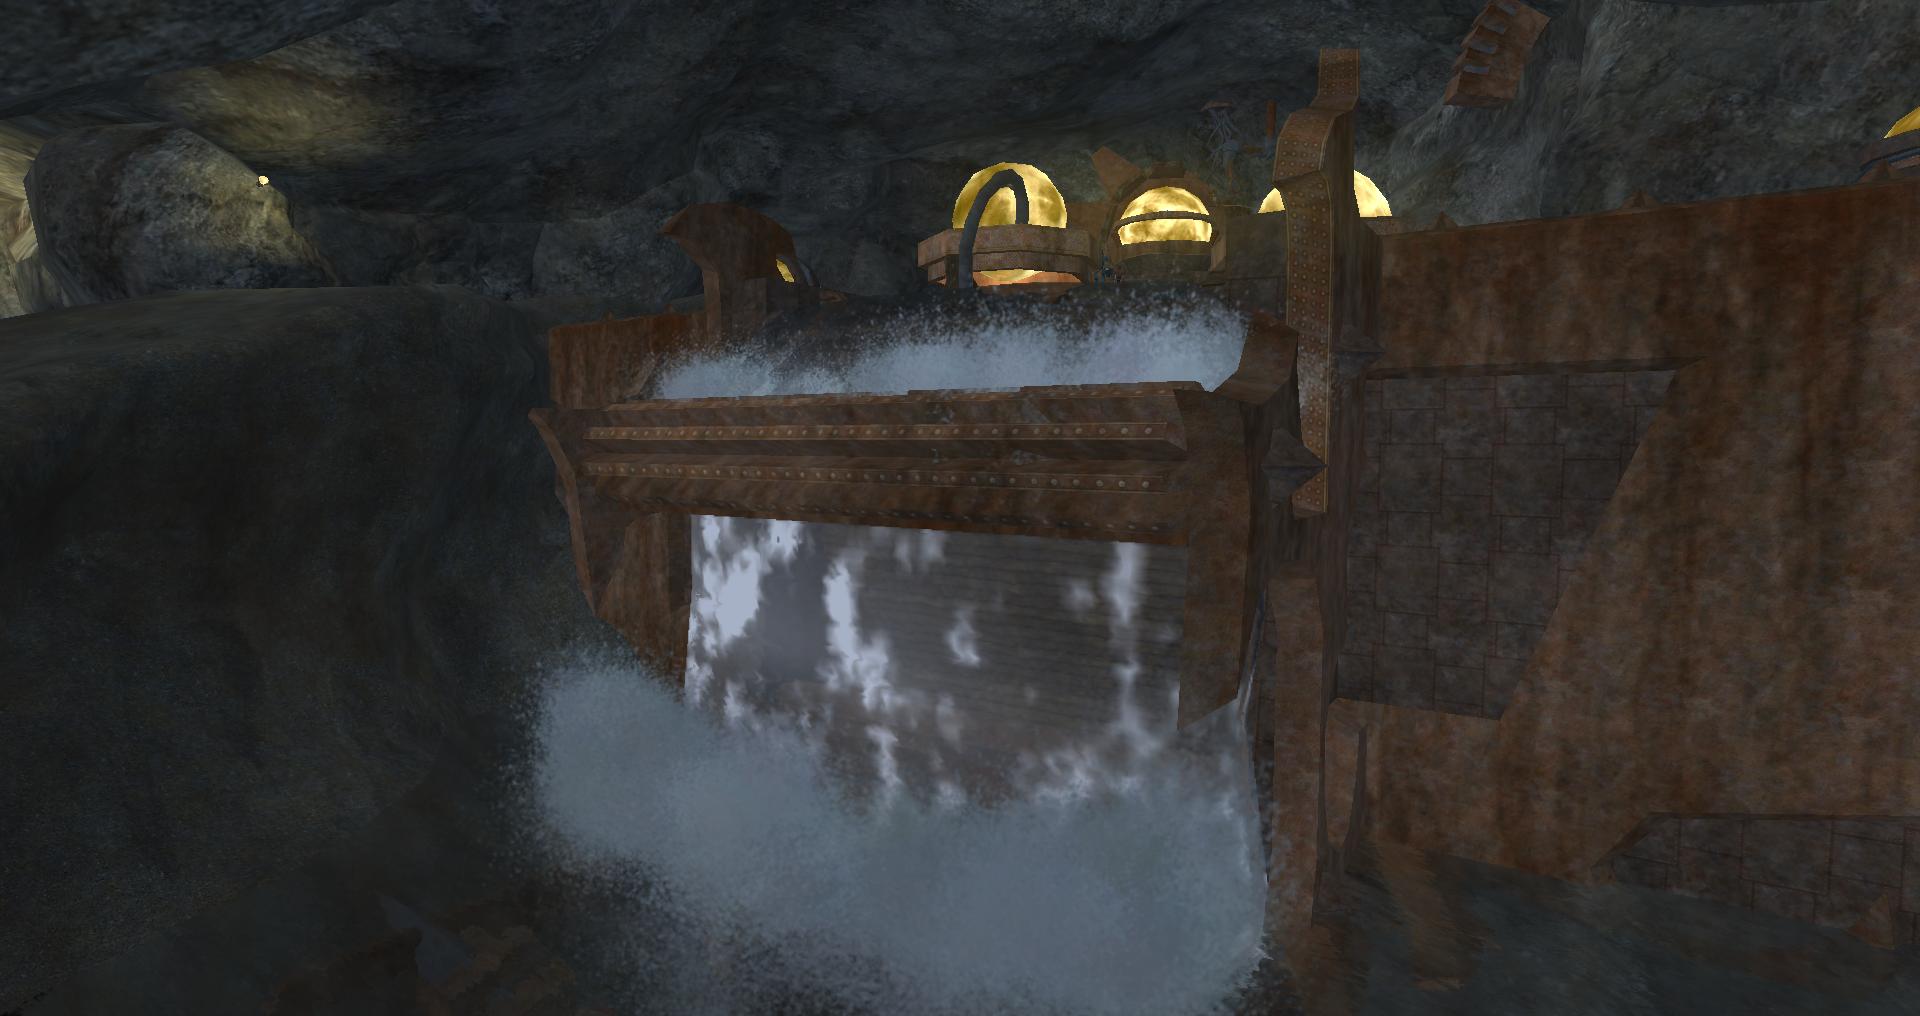 The Clockwork Hydroelectric Dam